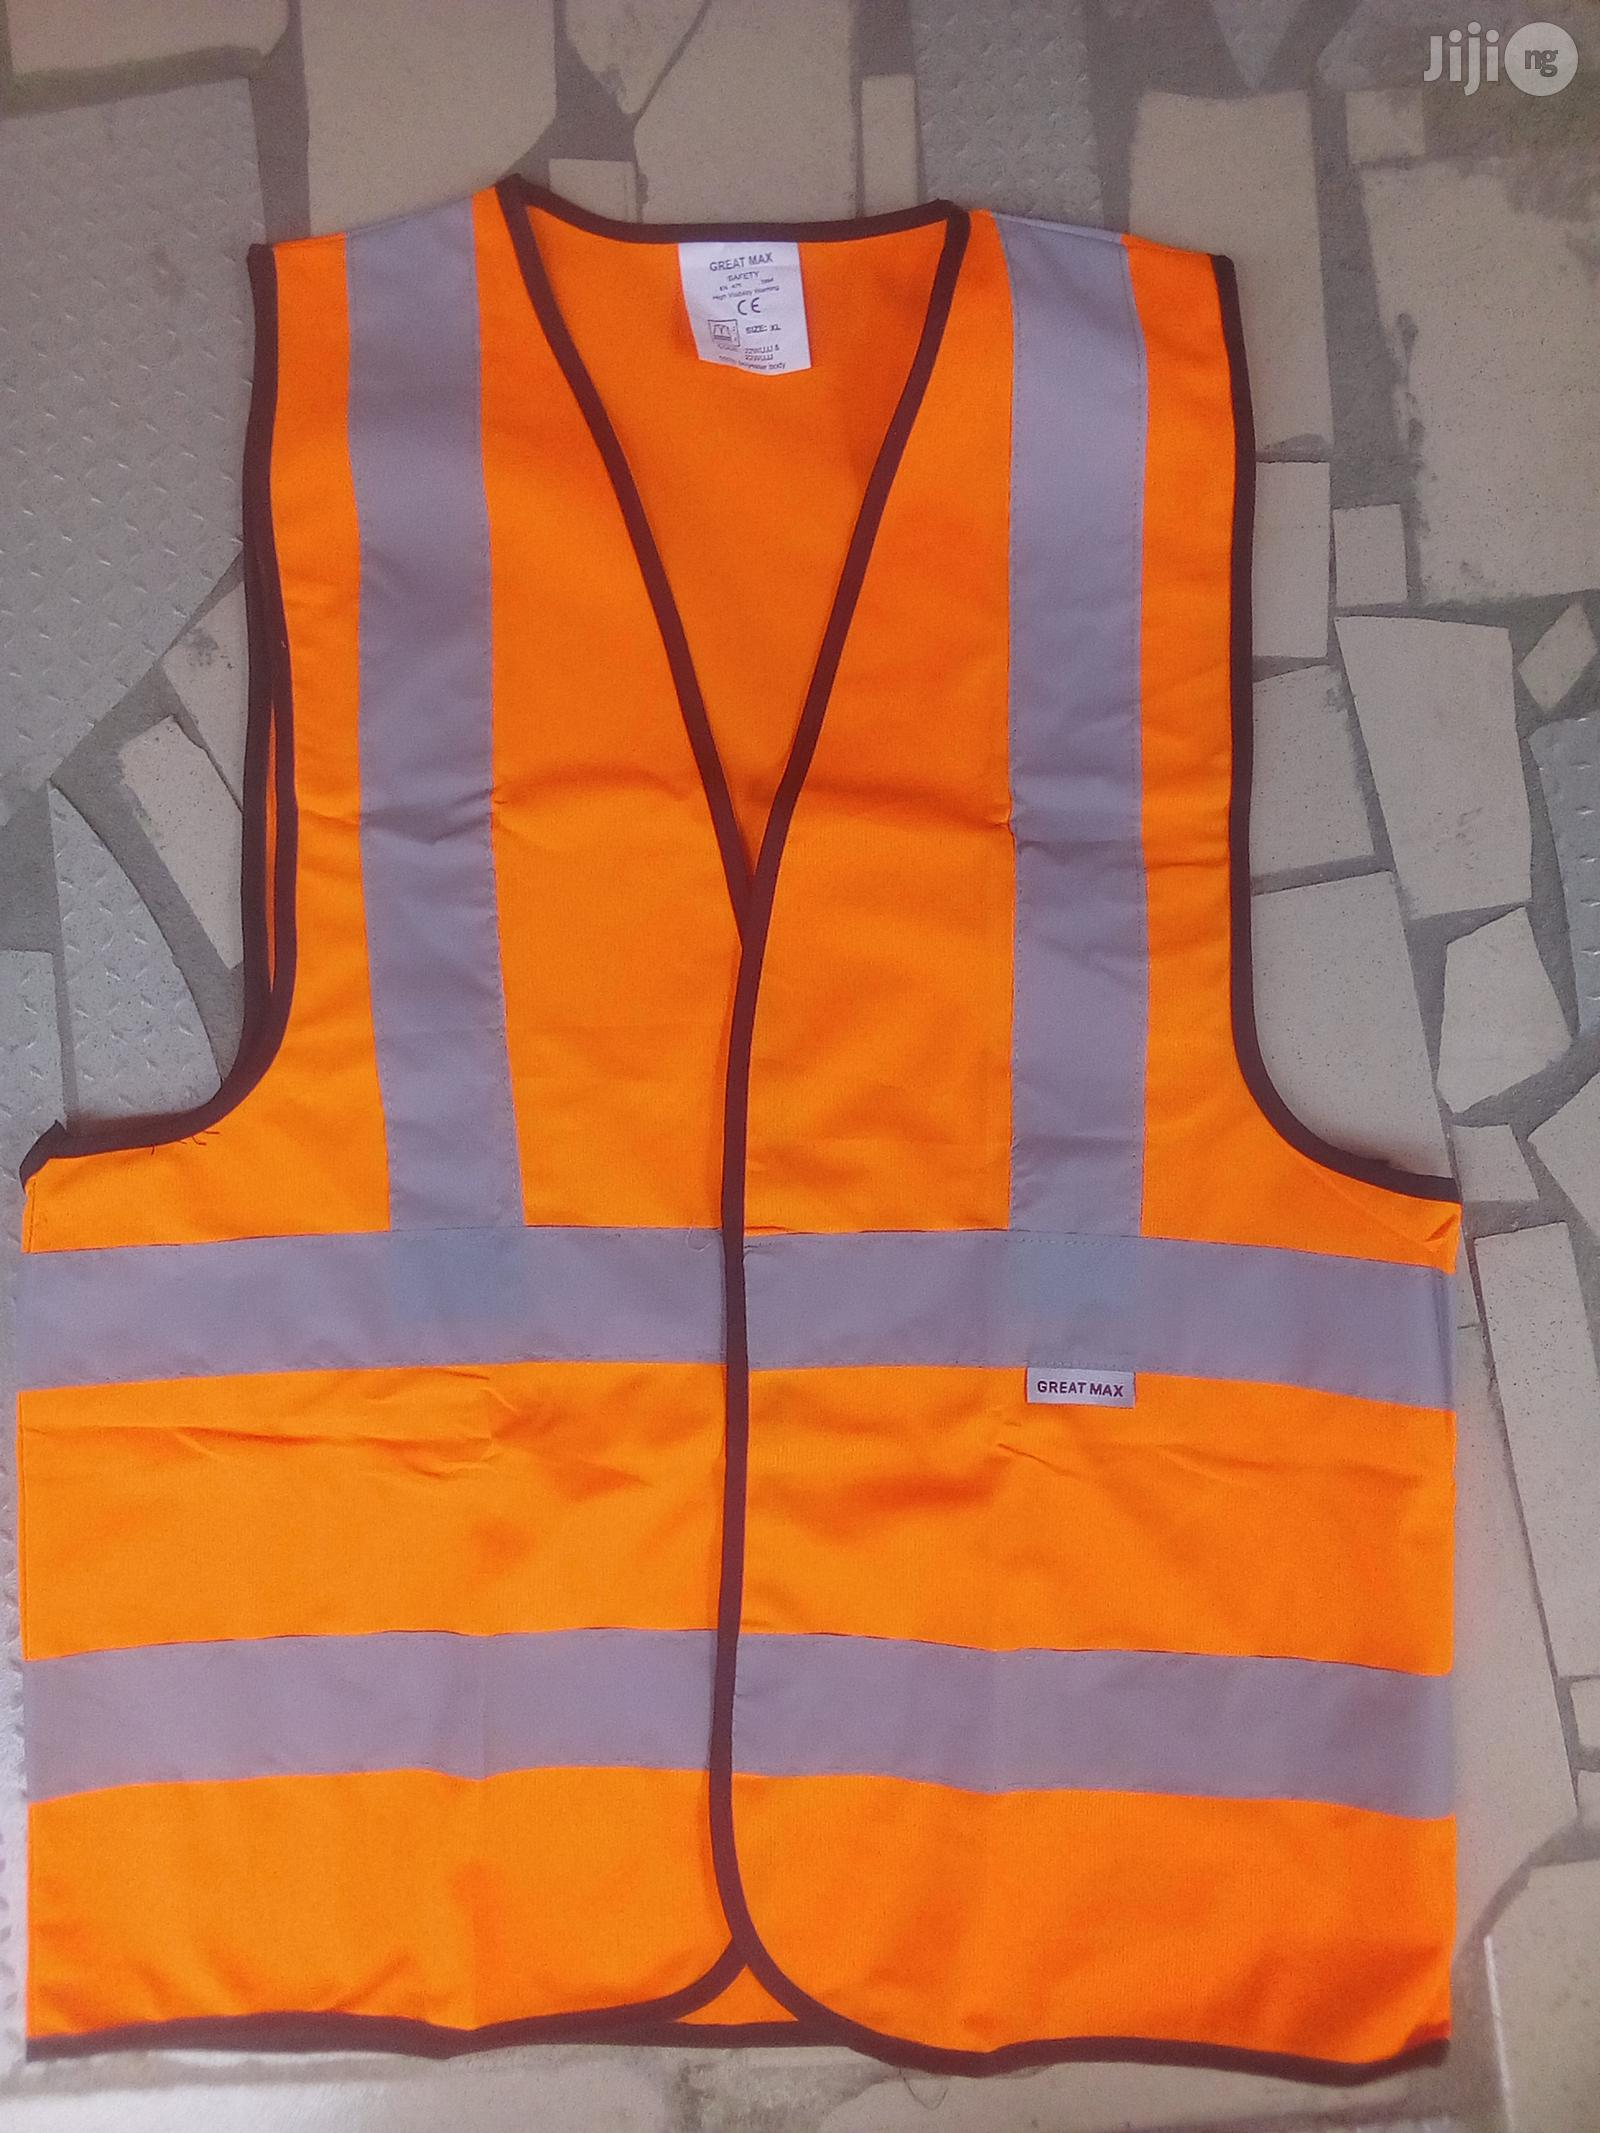 Safety Reflective Jacket. | Safetywear & Equipment for sale in Tureta, Sokoto State, Nigeria